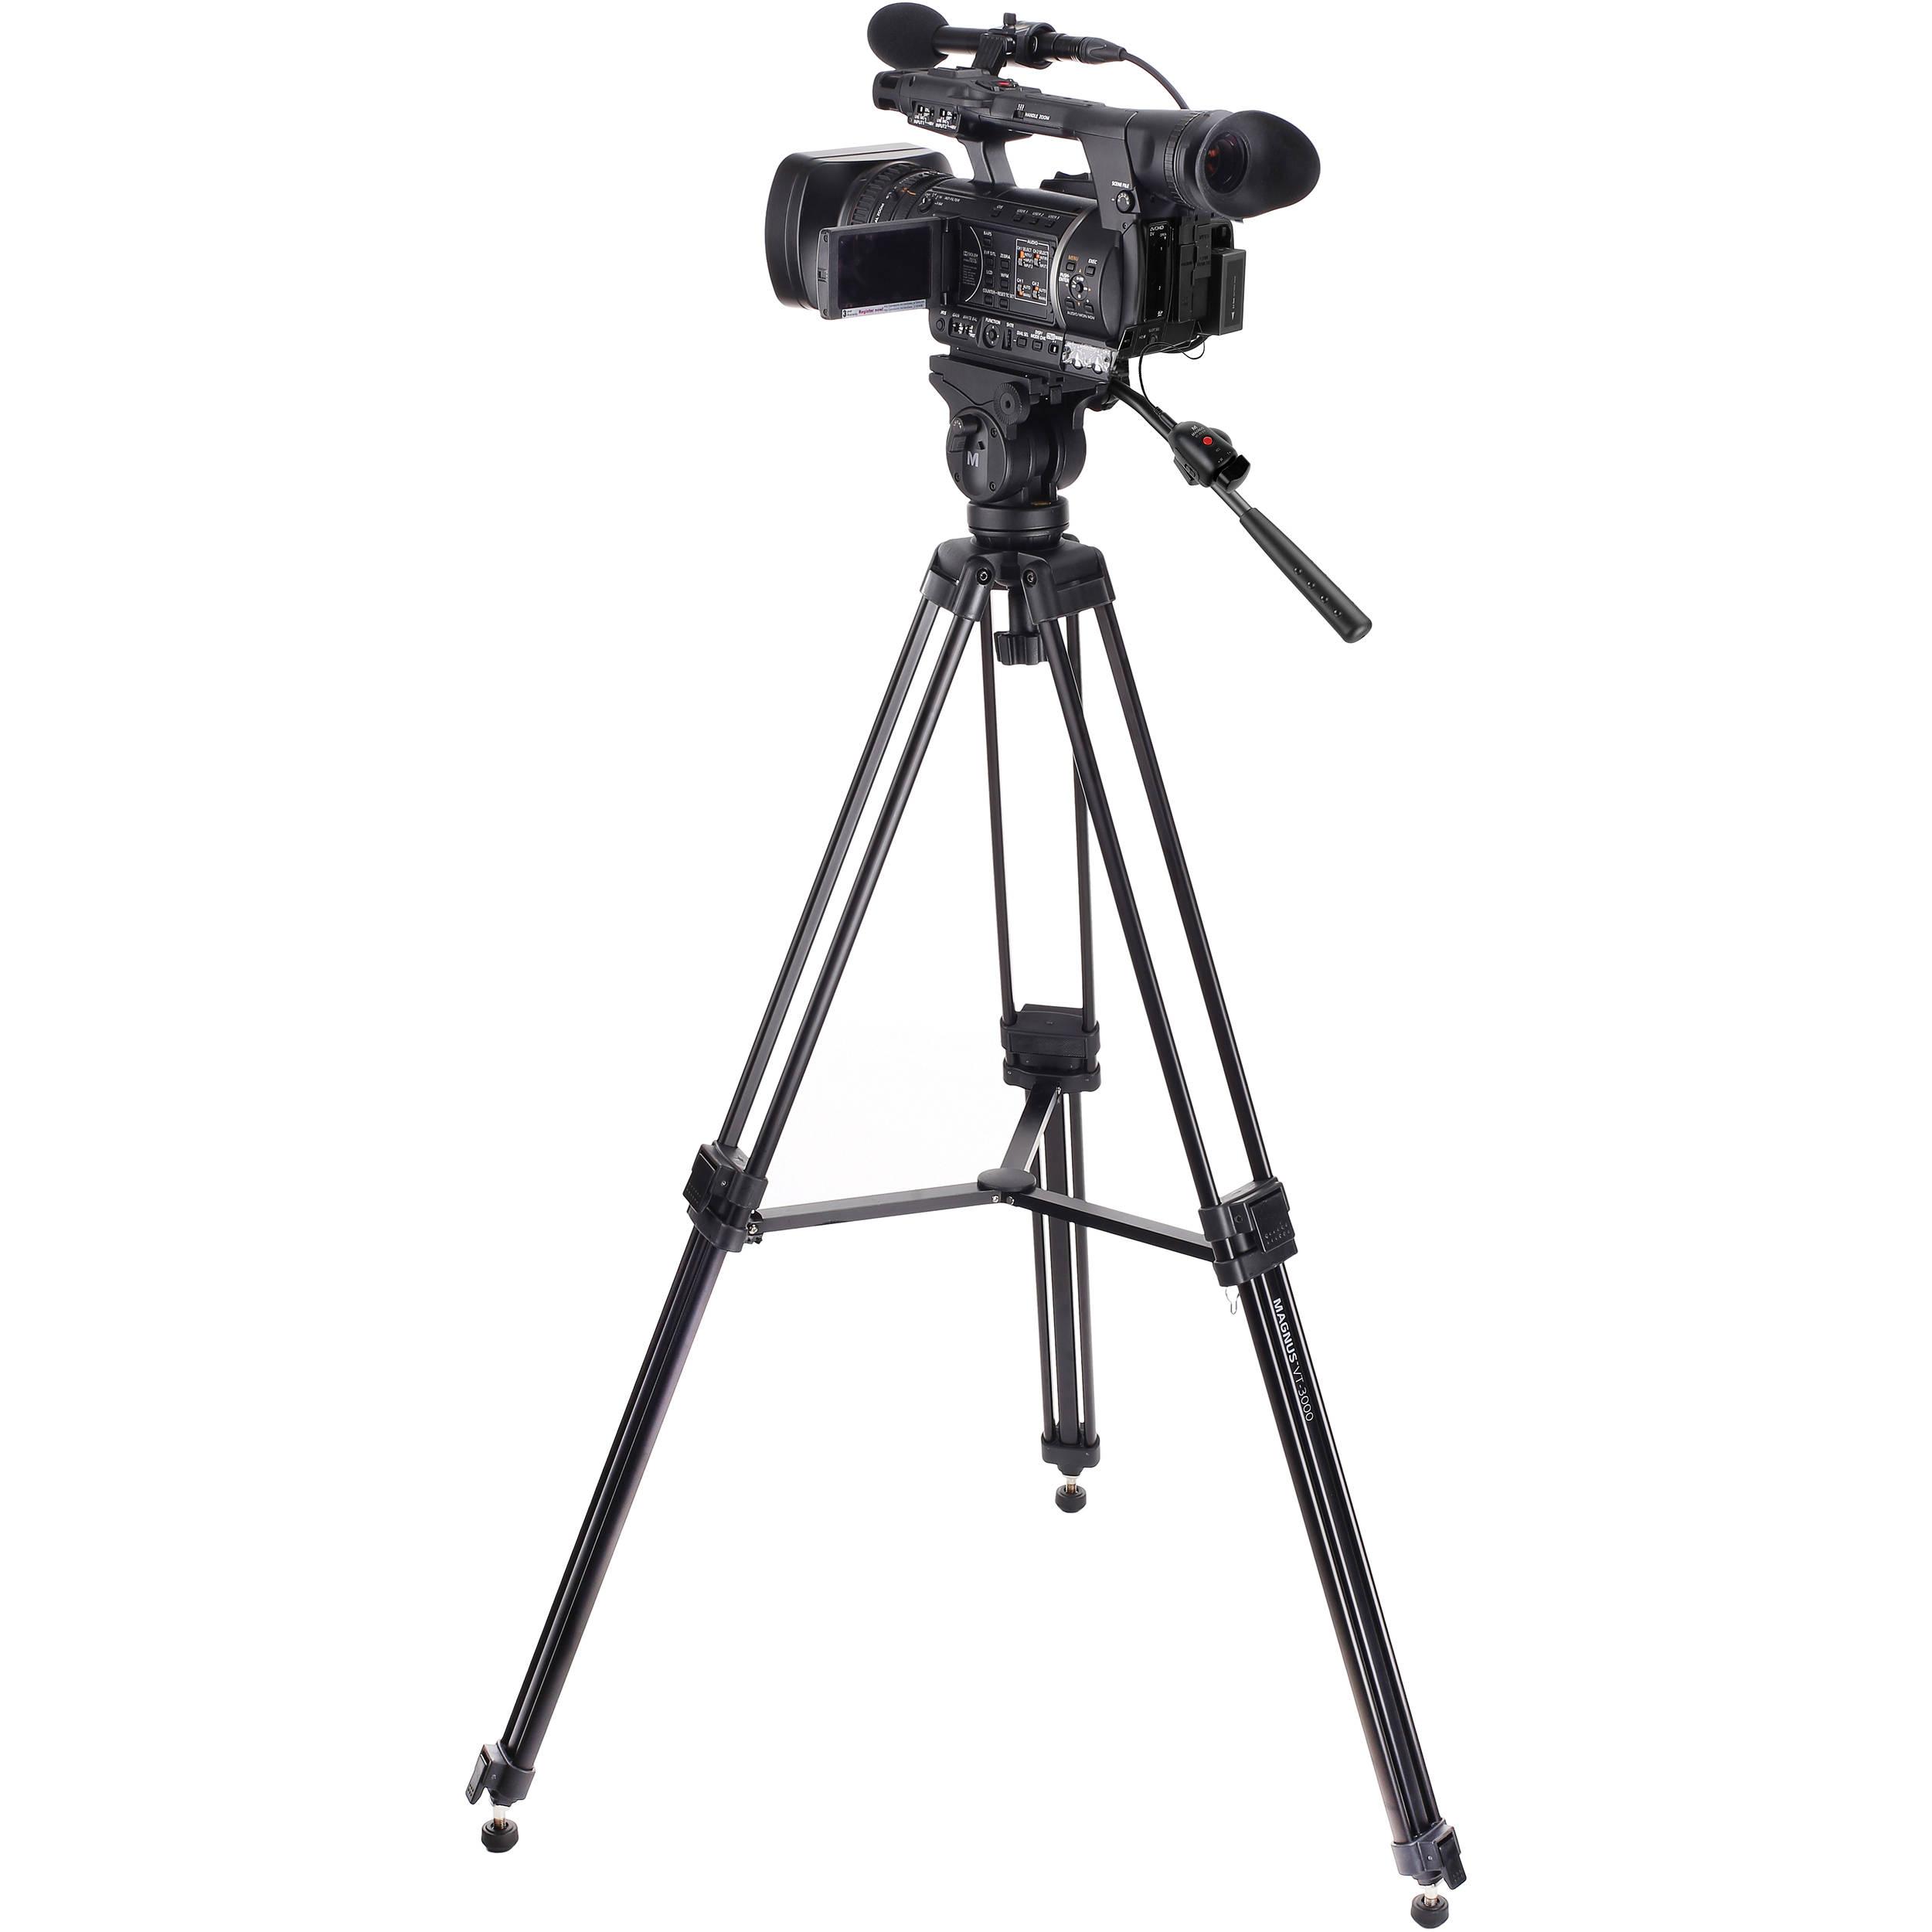 Magnus VT-3000 Tripod & Zoom Controller Kit VT-3000-K1 B&H